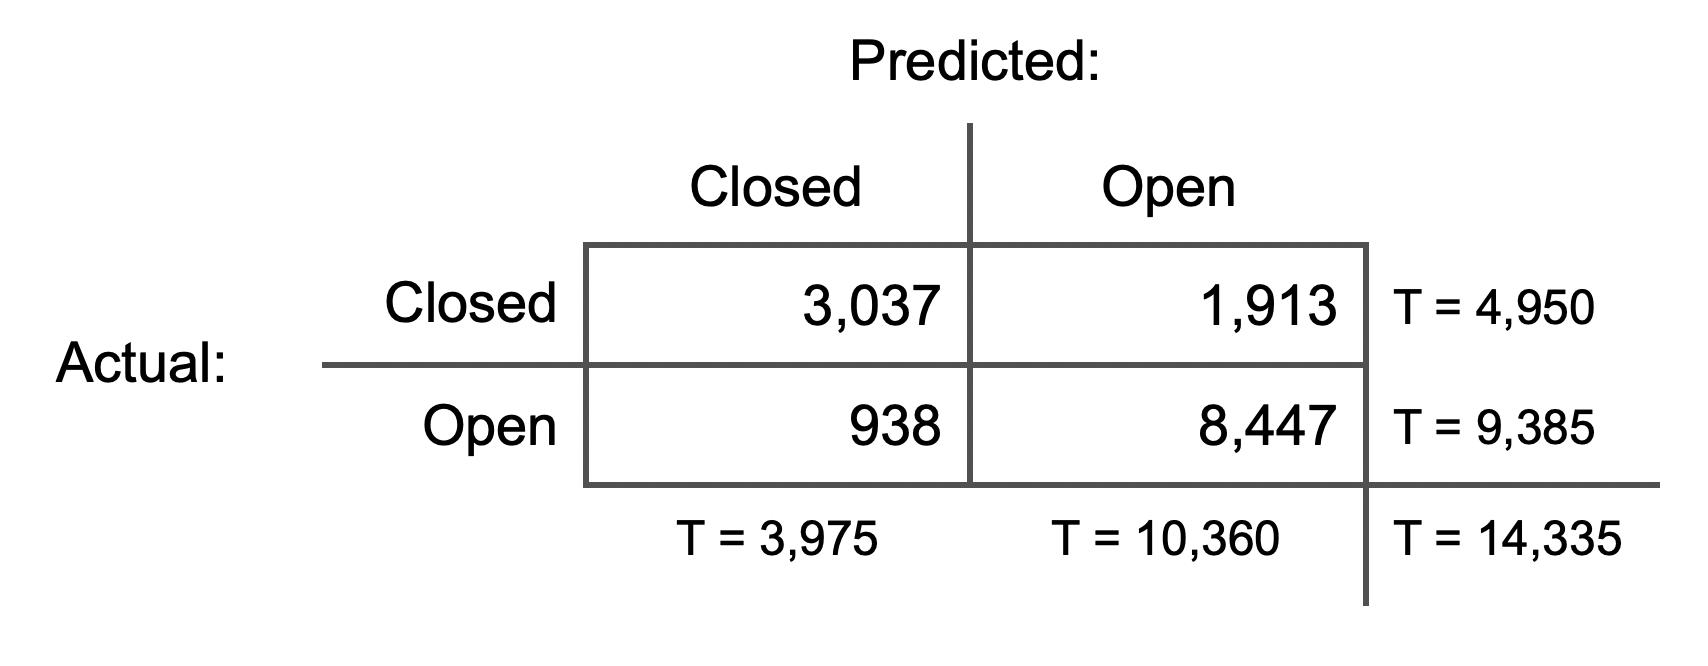 Predicted vs Actual results